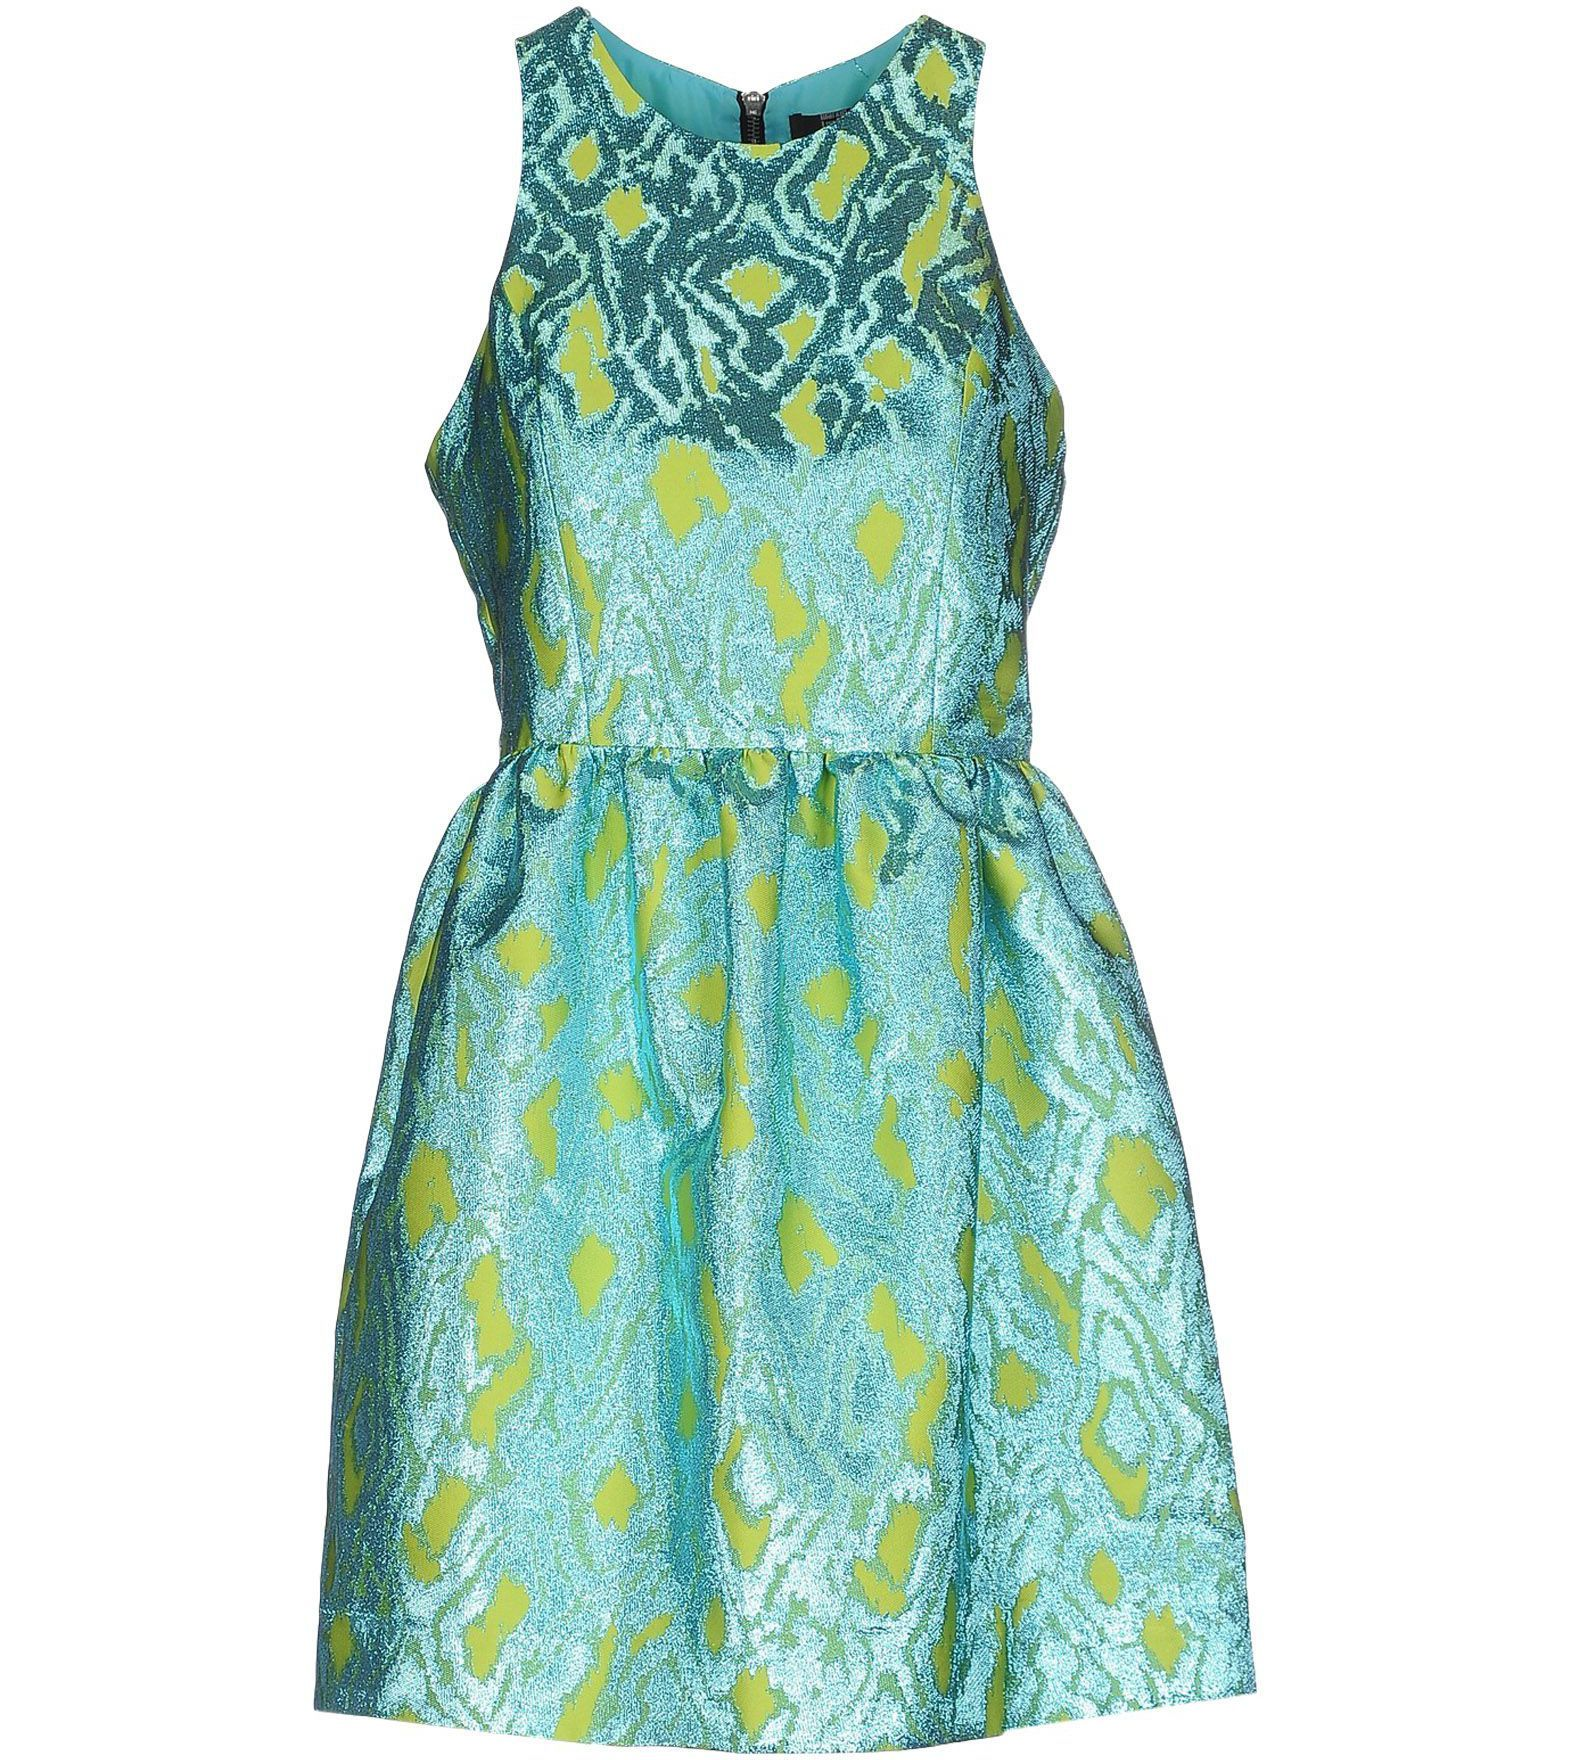 MARKUS LUPFER ΦΟΡΕΜΑΤΑ Κοντό φόρεμα μόνο 151.00€  onsale  style  fashion 401086b9d70